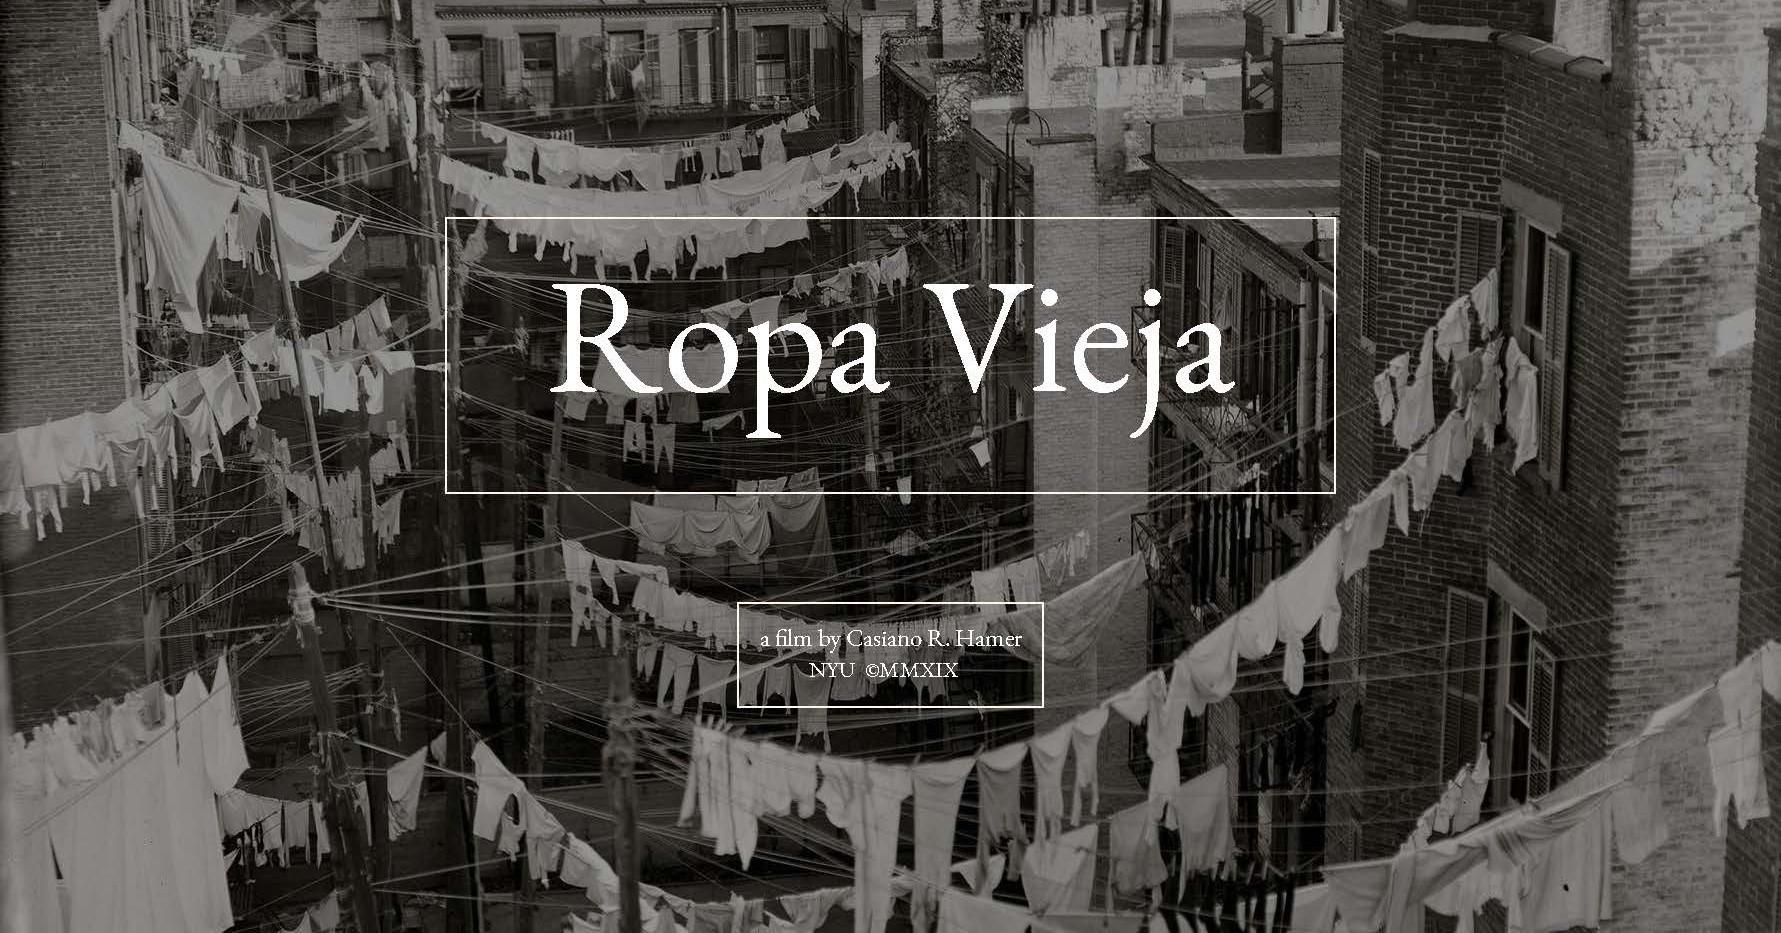 Casiano_MOS Ropa Vieja Moodboard-1.pdf_P